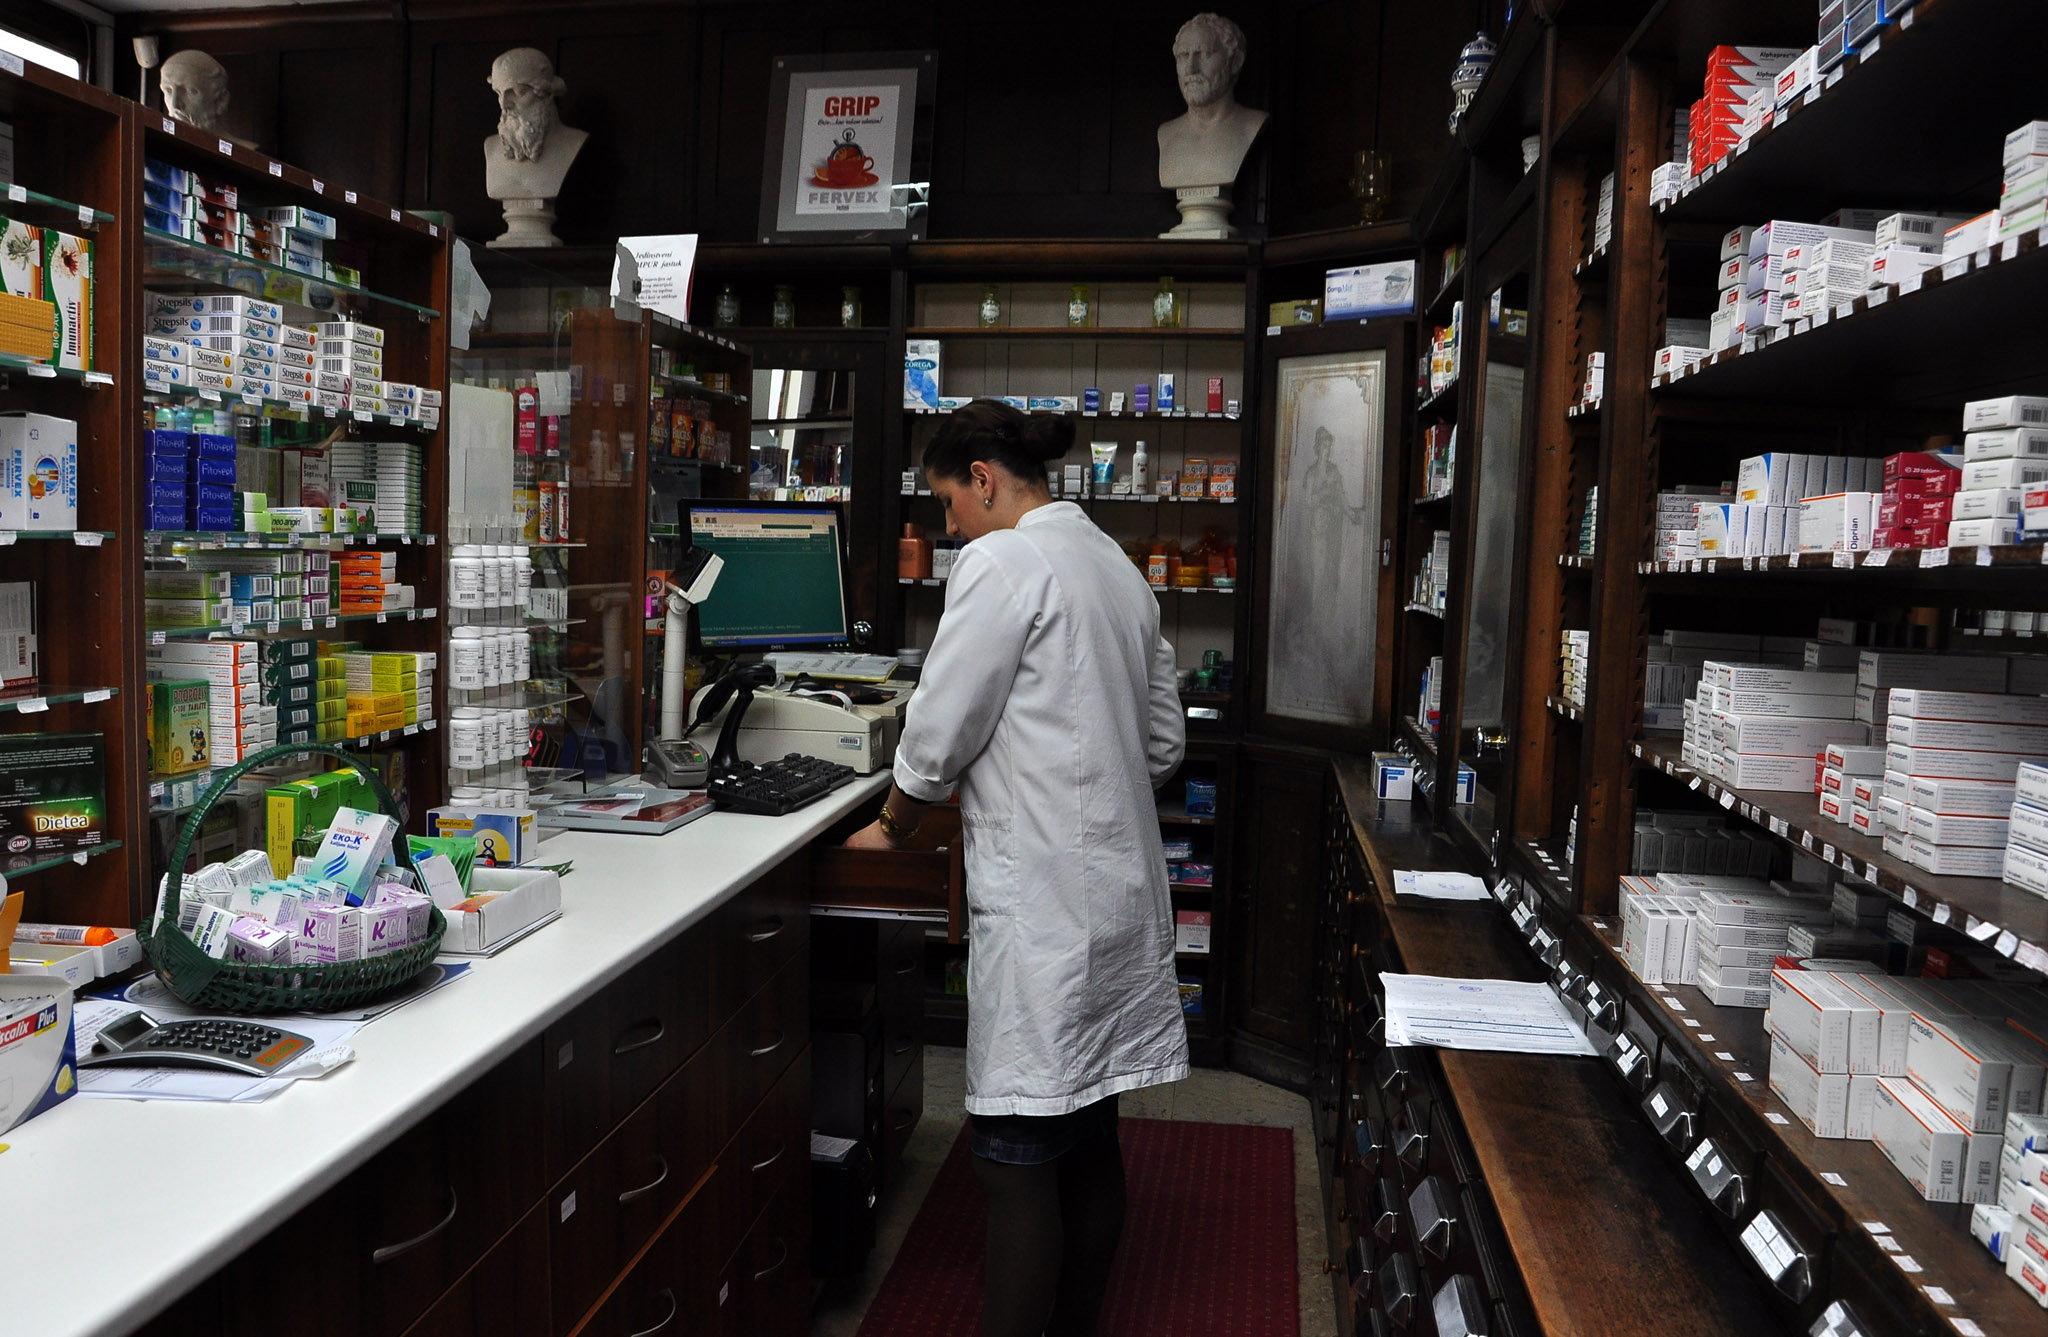 Cialis cena u apotekama u srbiji